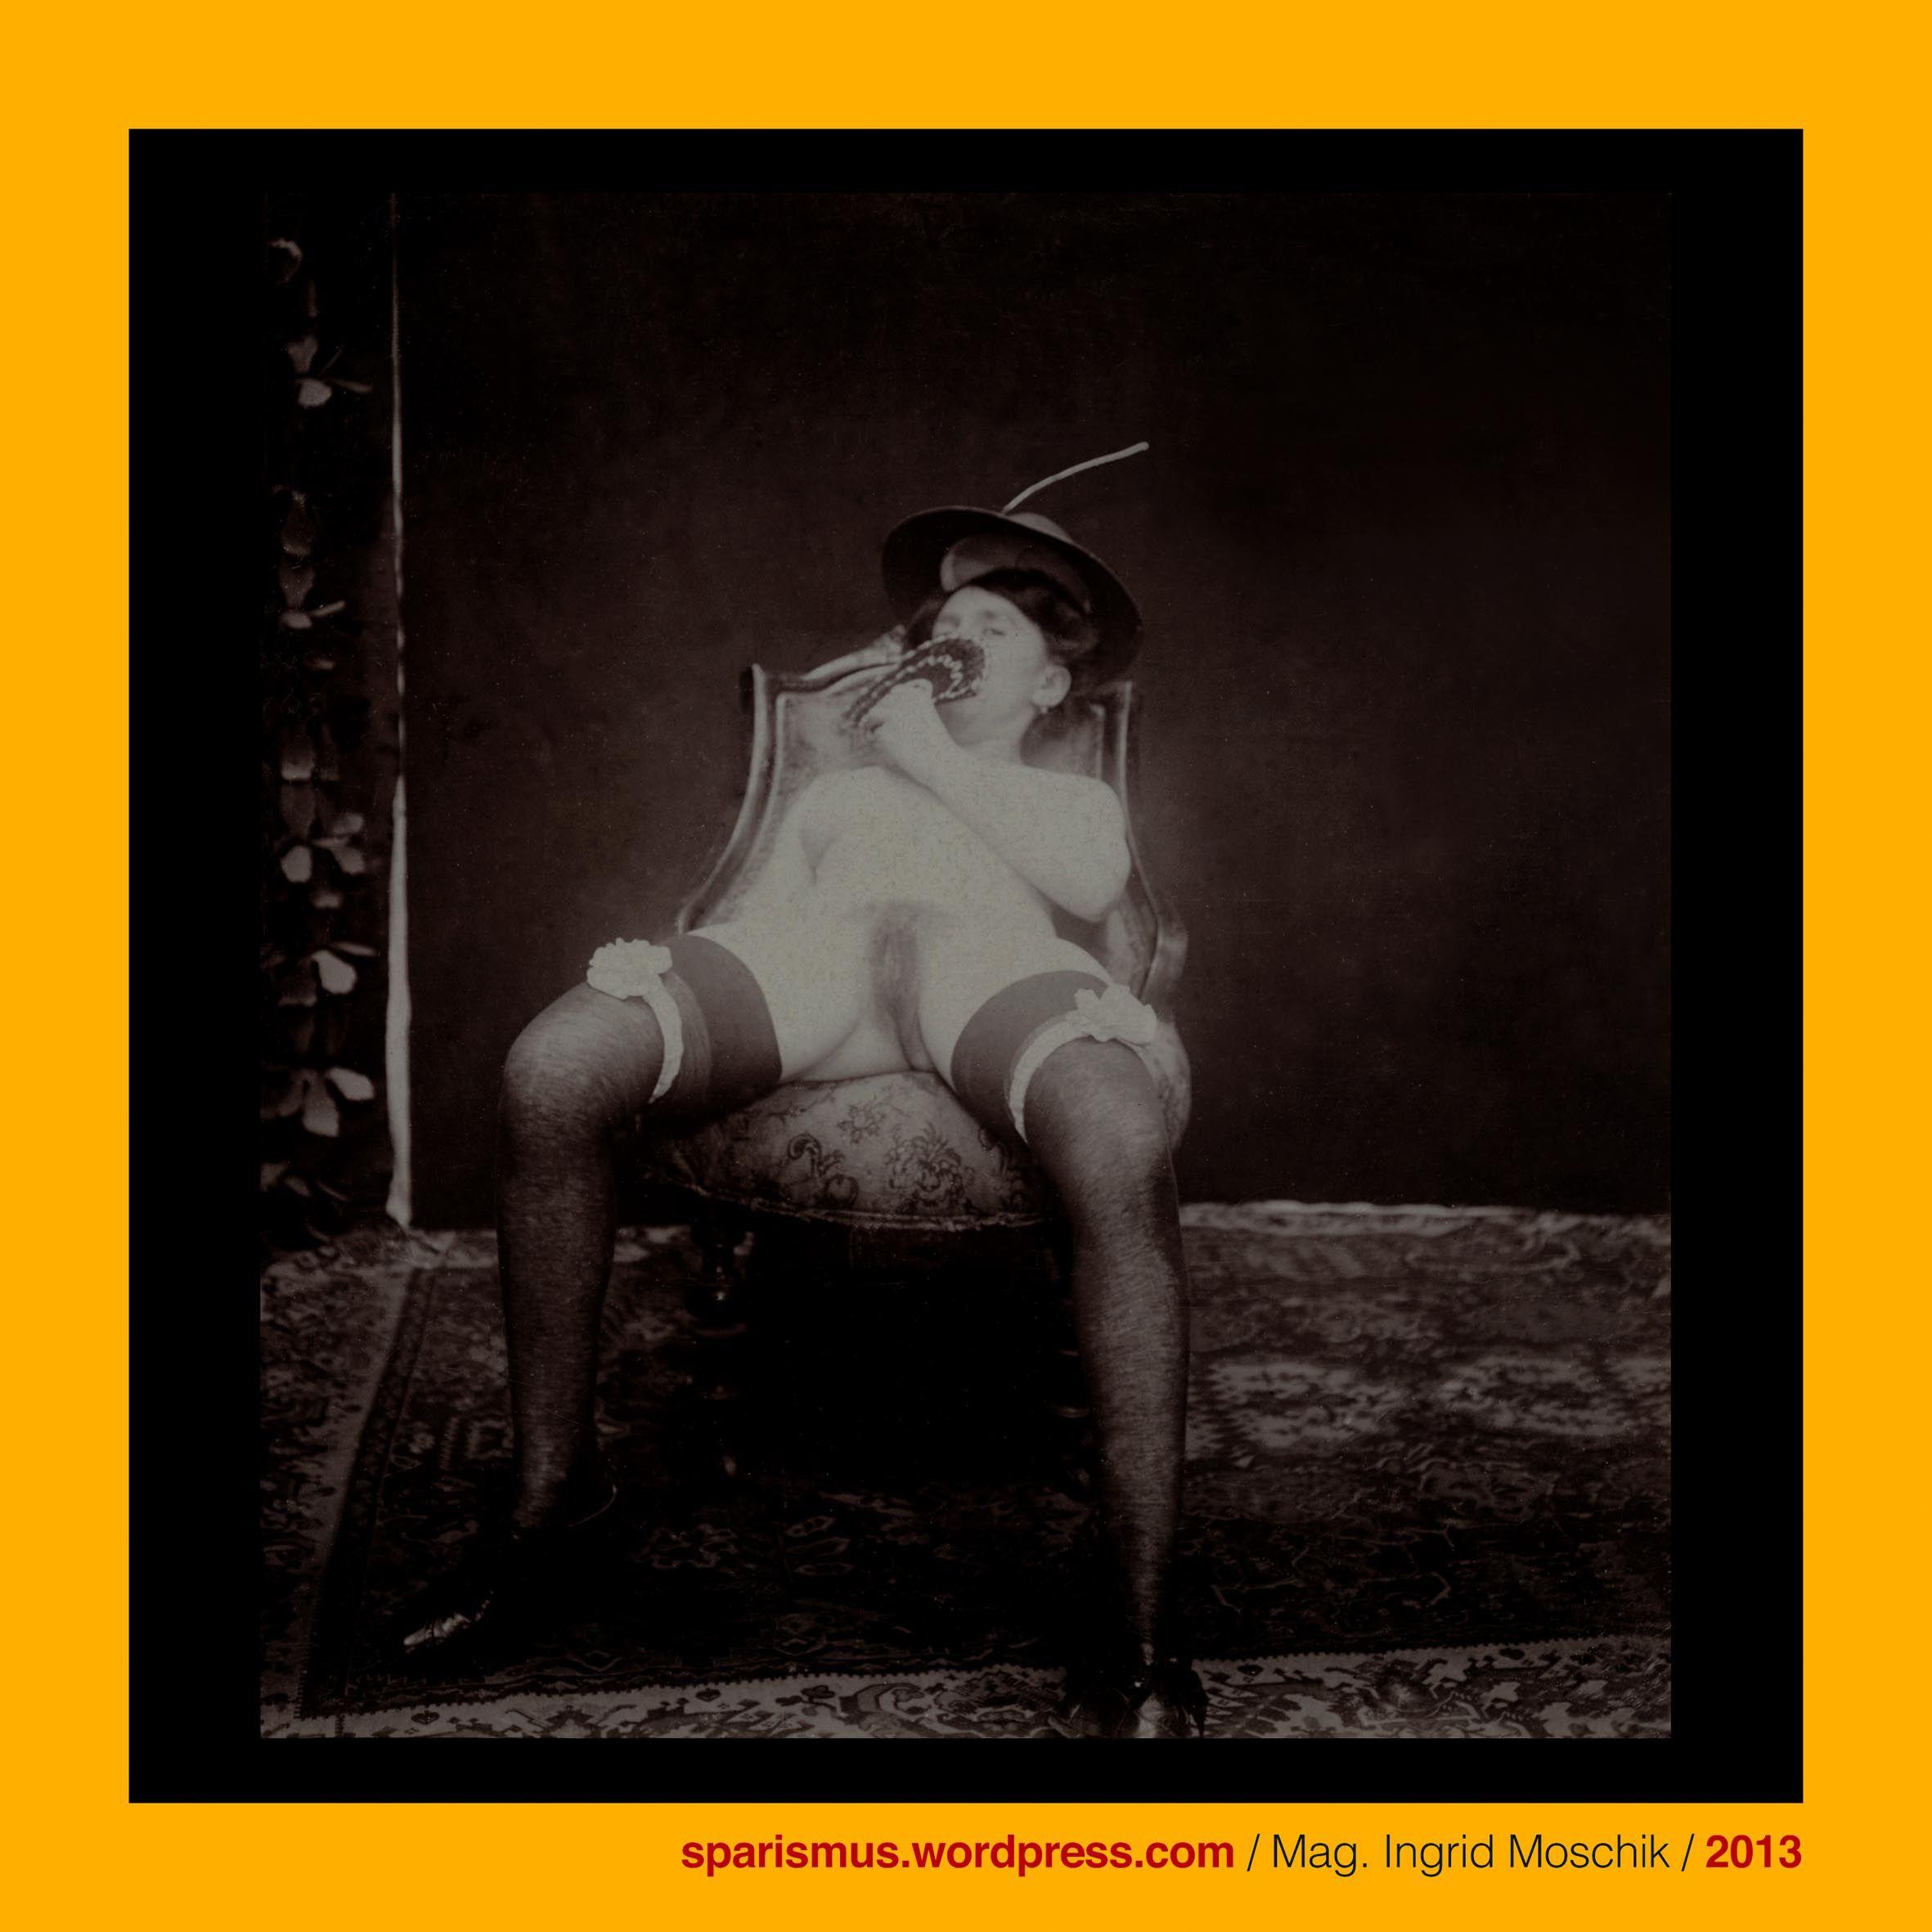 Naked quin morgendorffer